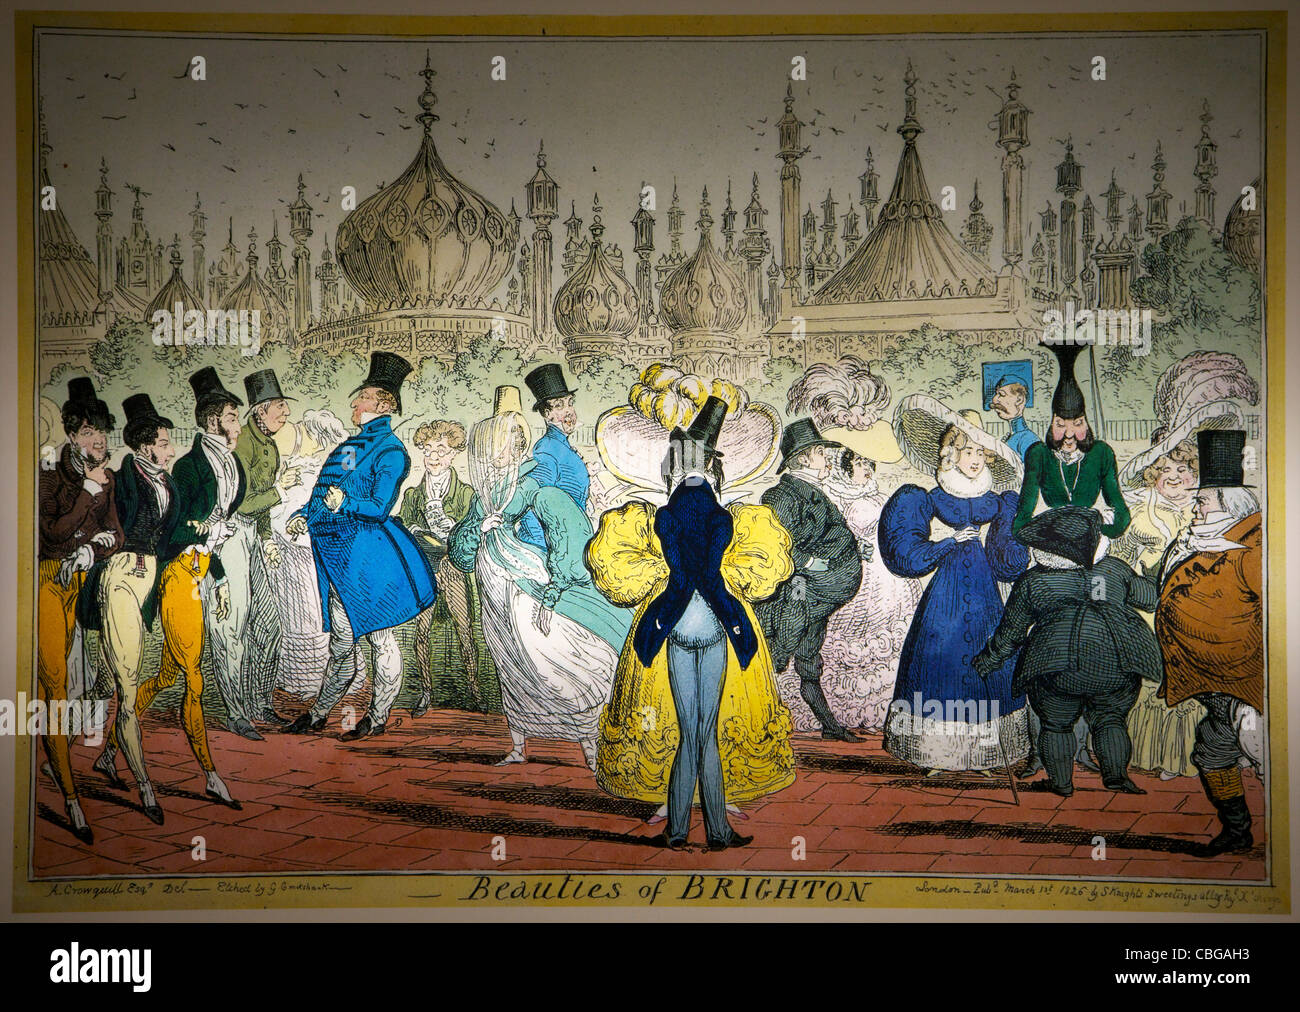 Beauties of Brighton, old coloured print, Brighton Pavilion, West Sussex, England, UK, United Kingdom, GB, Great - Stock Image